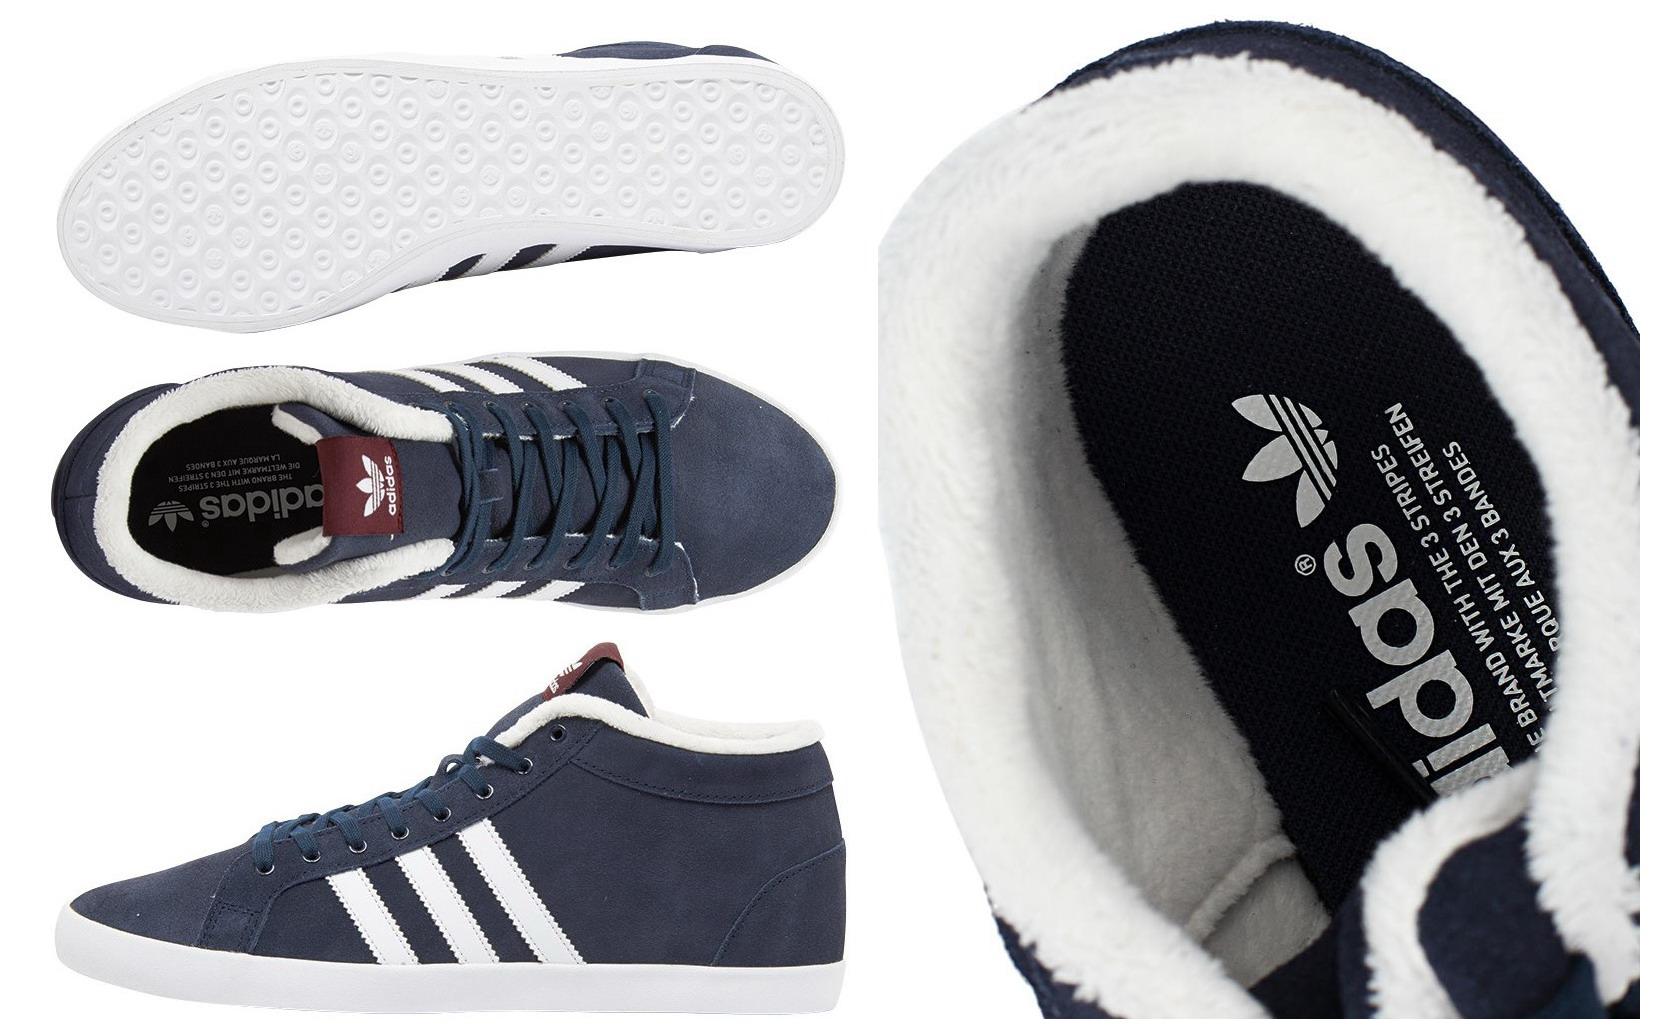 wholesale dealer 27ac4 17109 Adidas Originals Adria PS Mid buty damskie 38 23